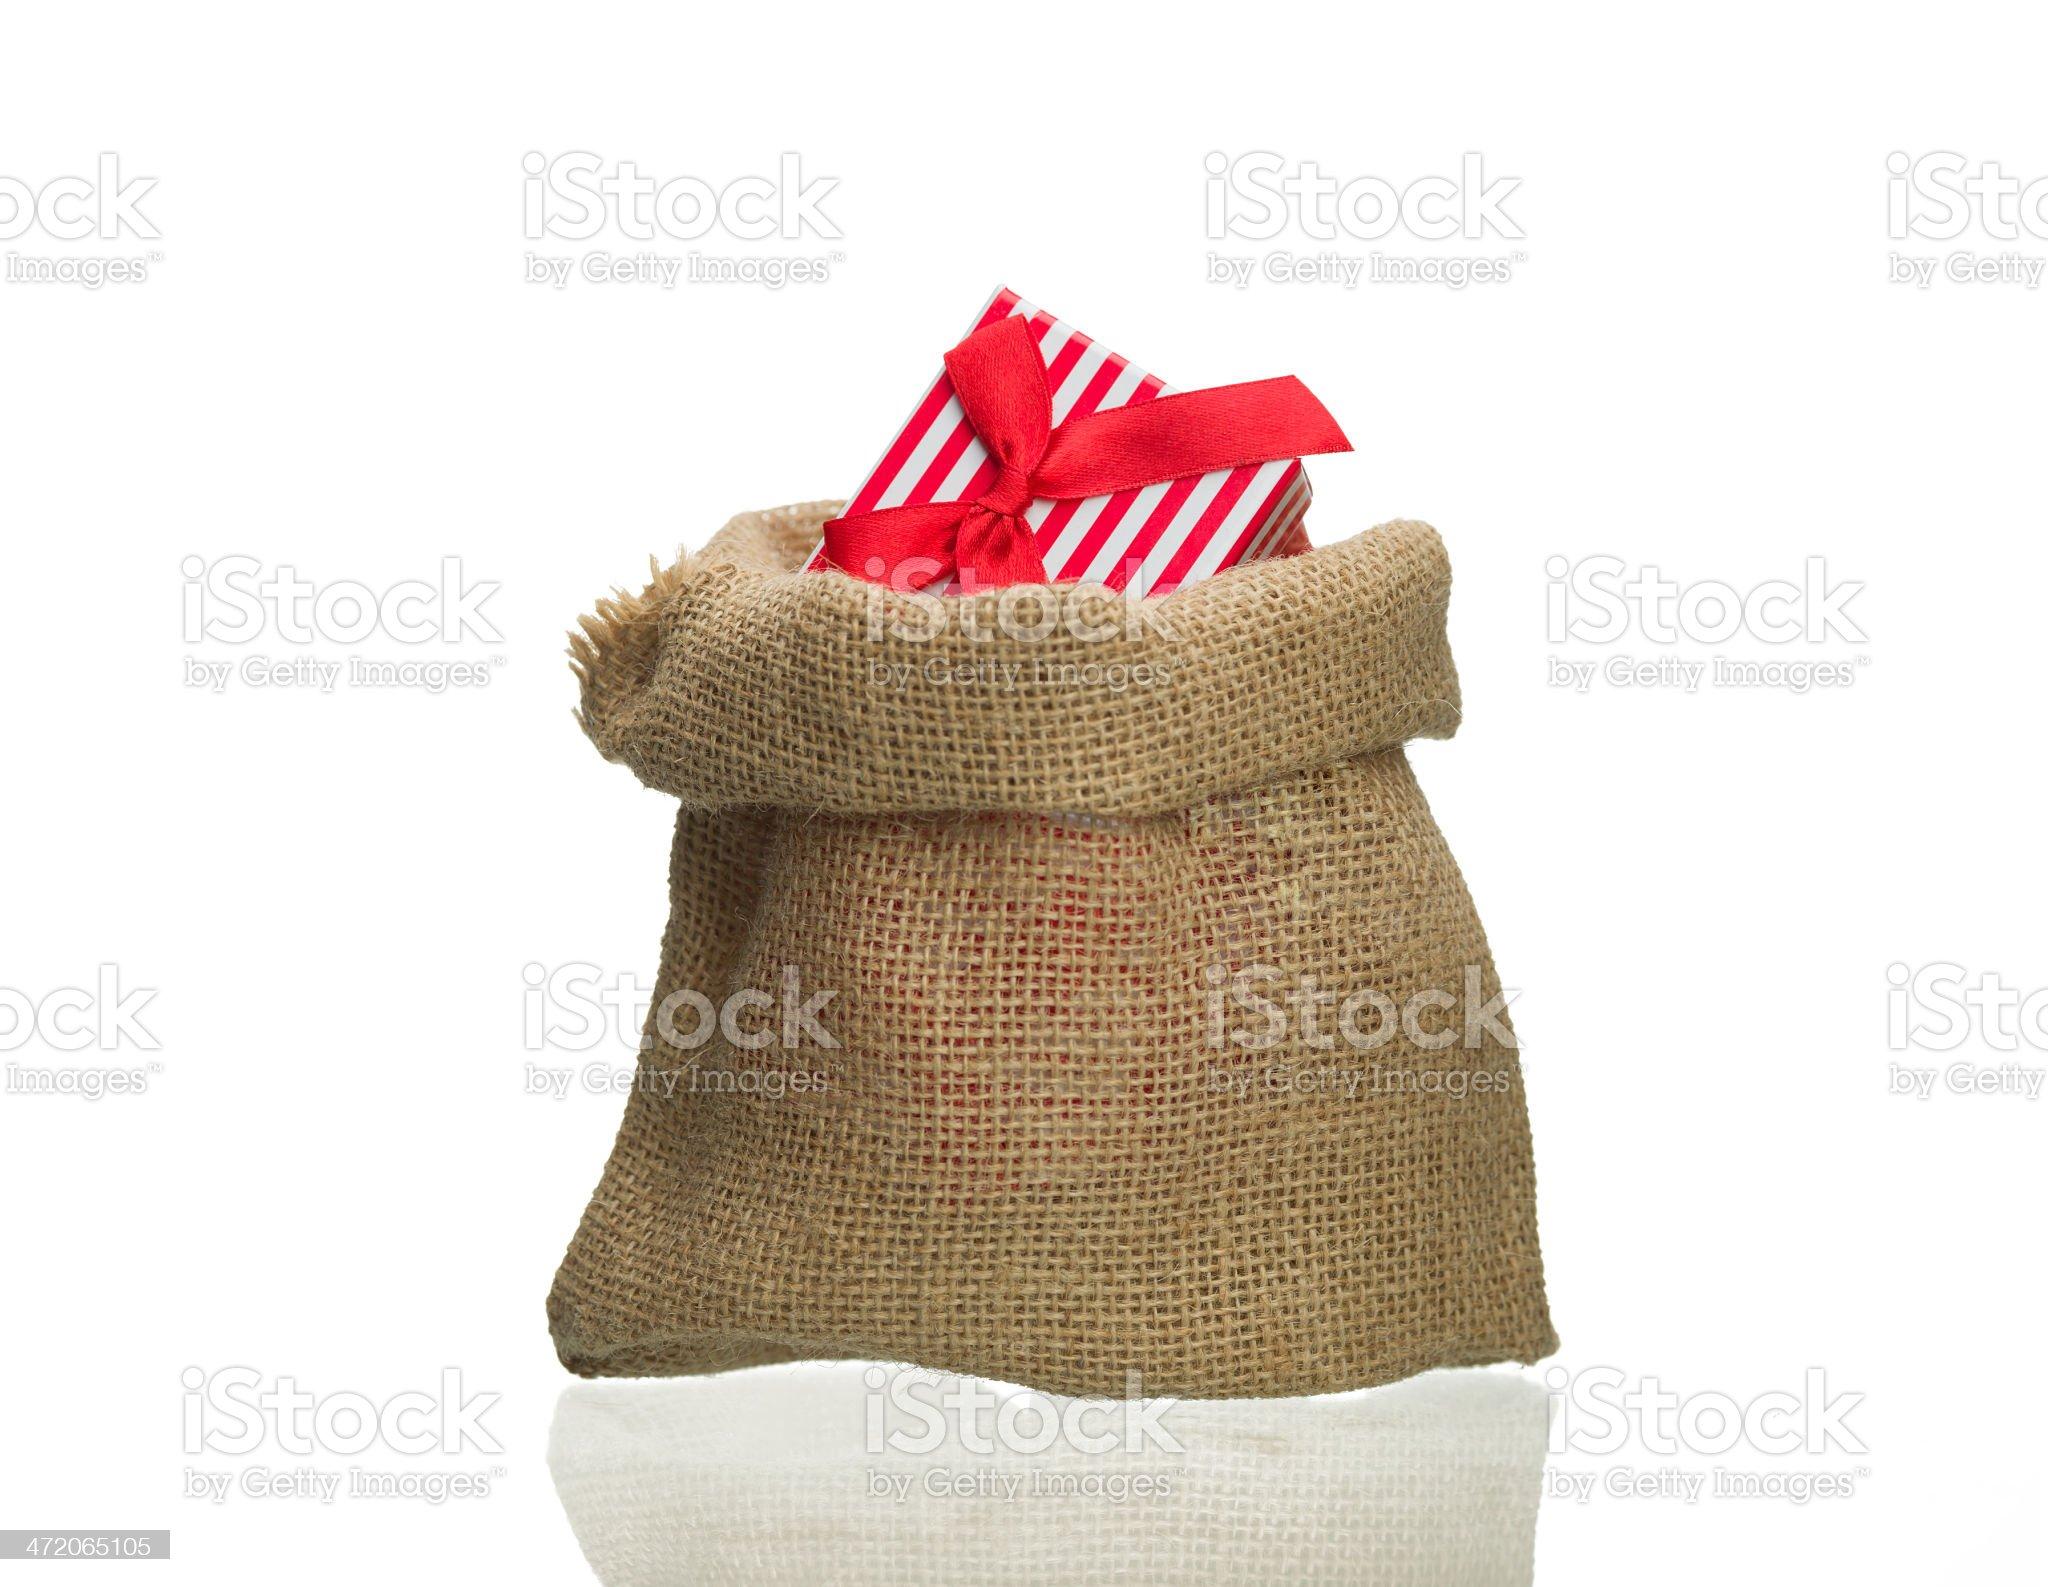 Sack with christmas presents box on white royalty-free stock photo